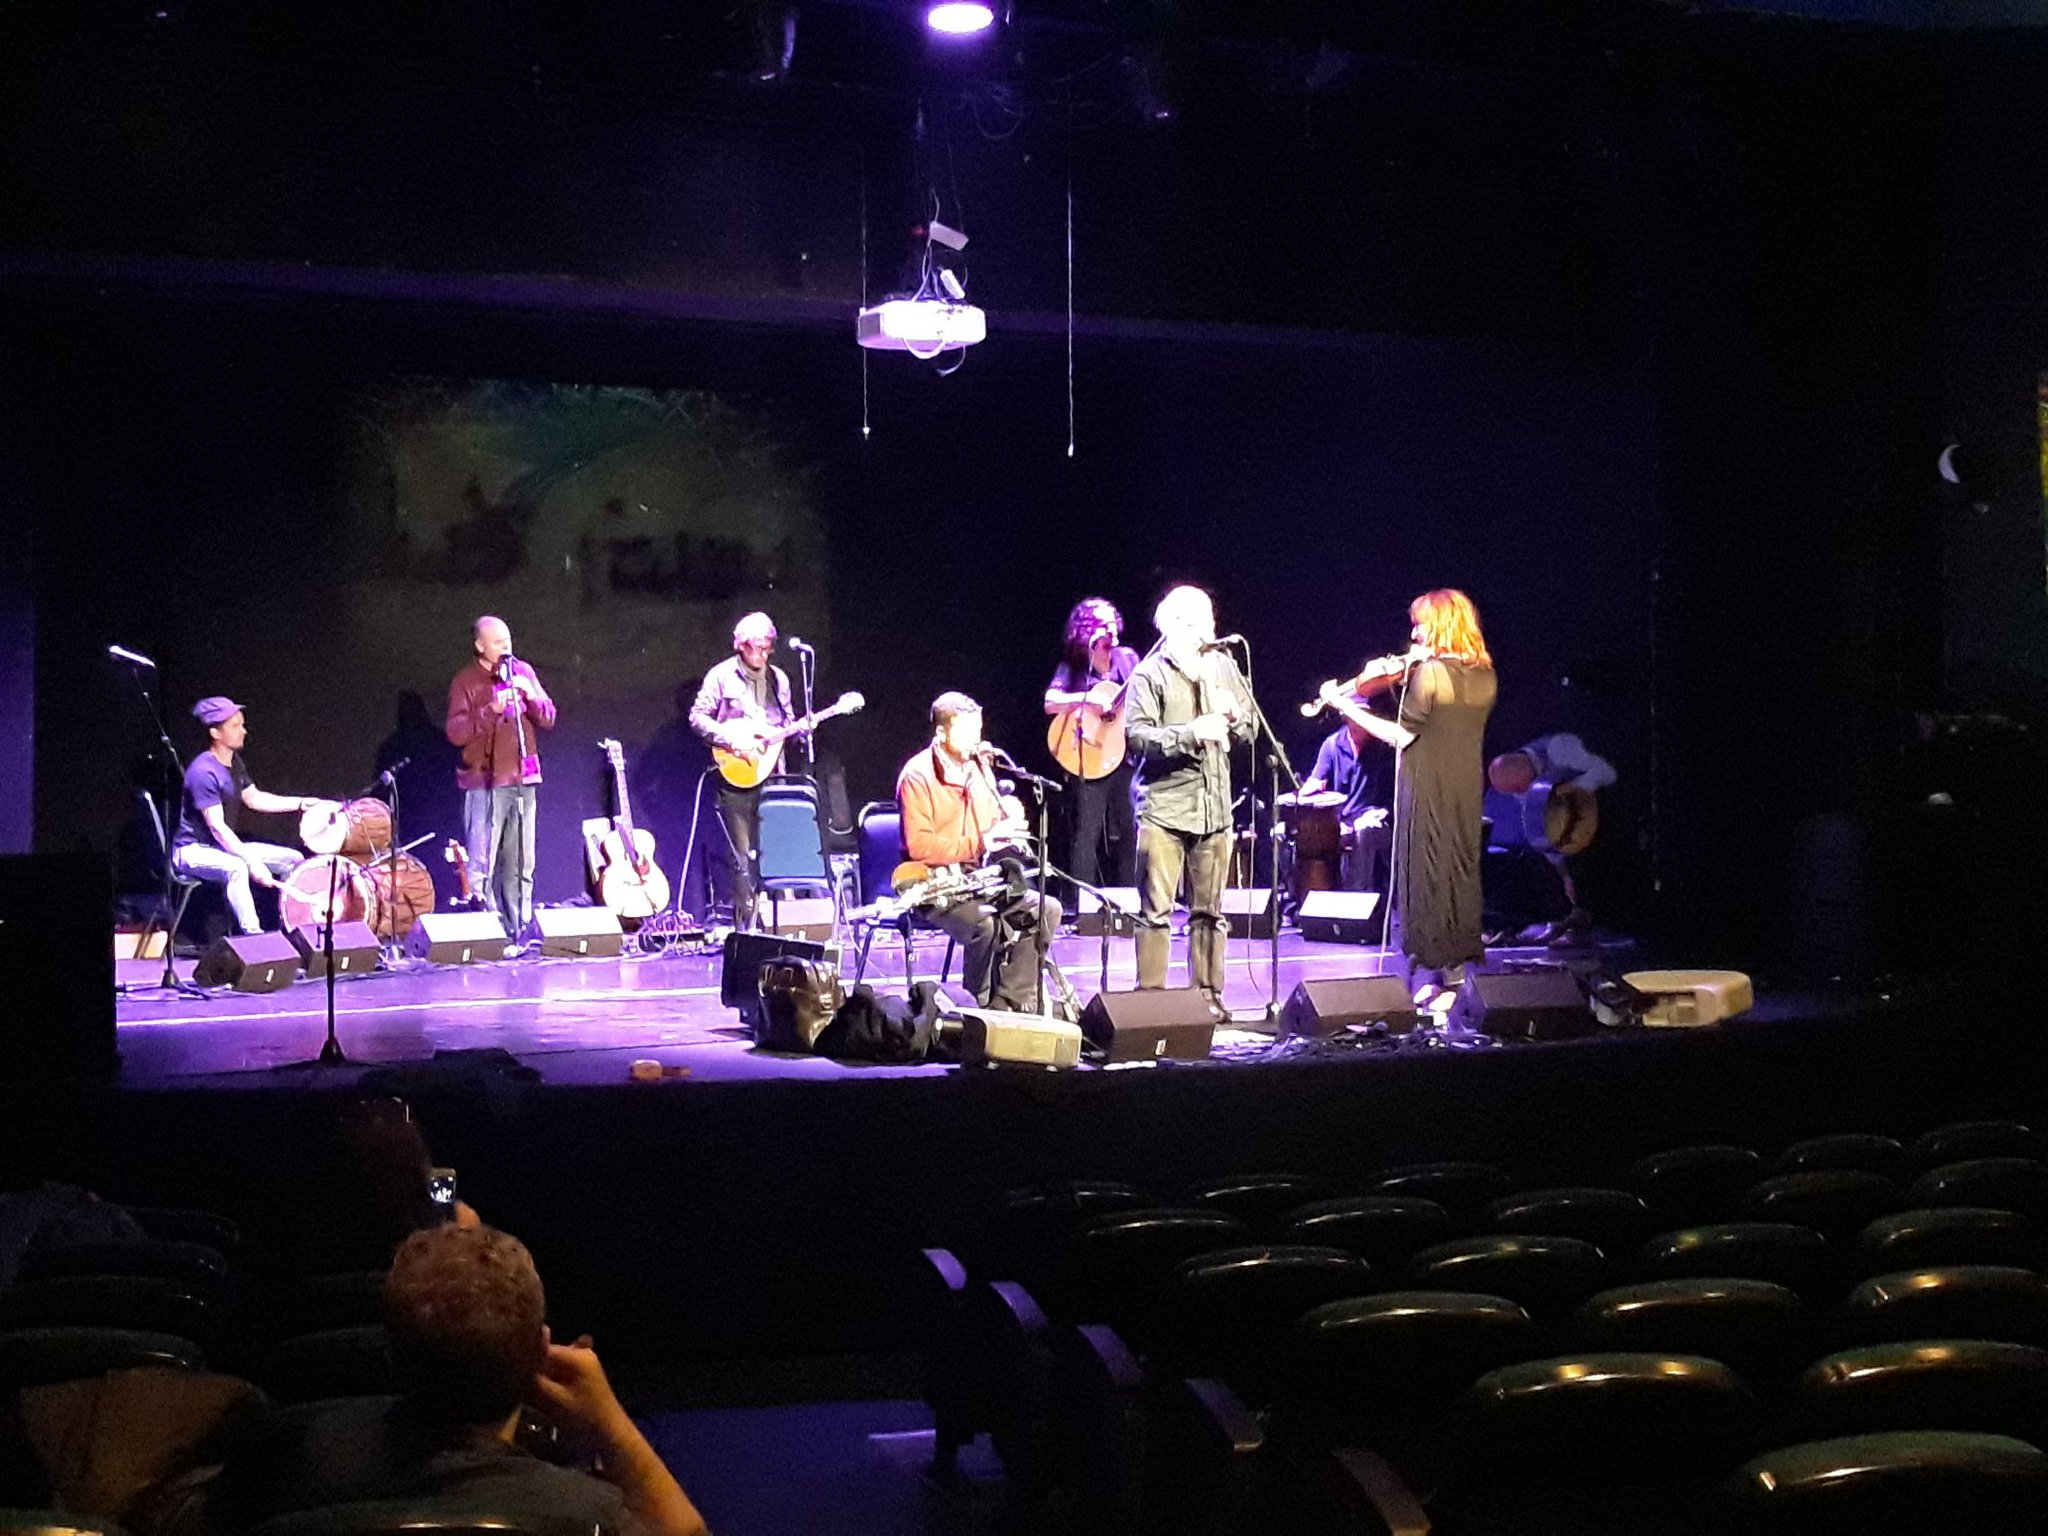 @KilaRecords soundchecking for #Sendiana @ipsc48 @PalFestIreland tonight at 8pm Liberty Hall. ���� https://t.co/I9JC9EeiL9